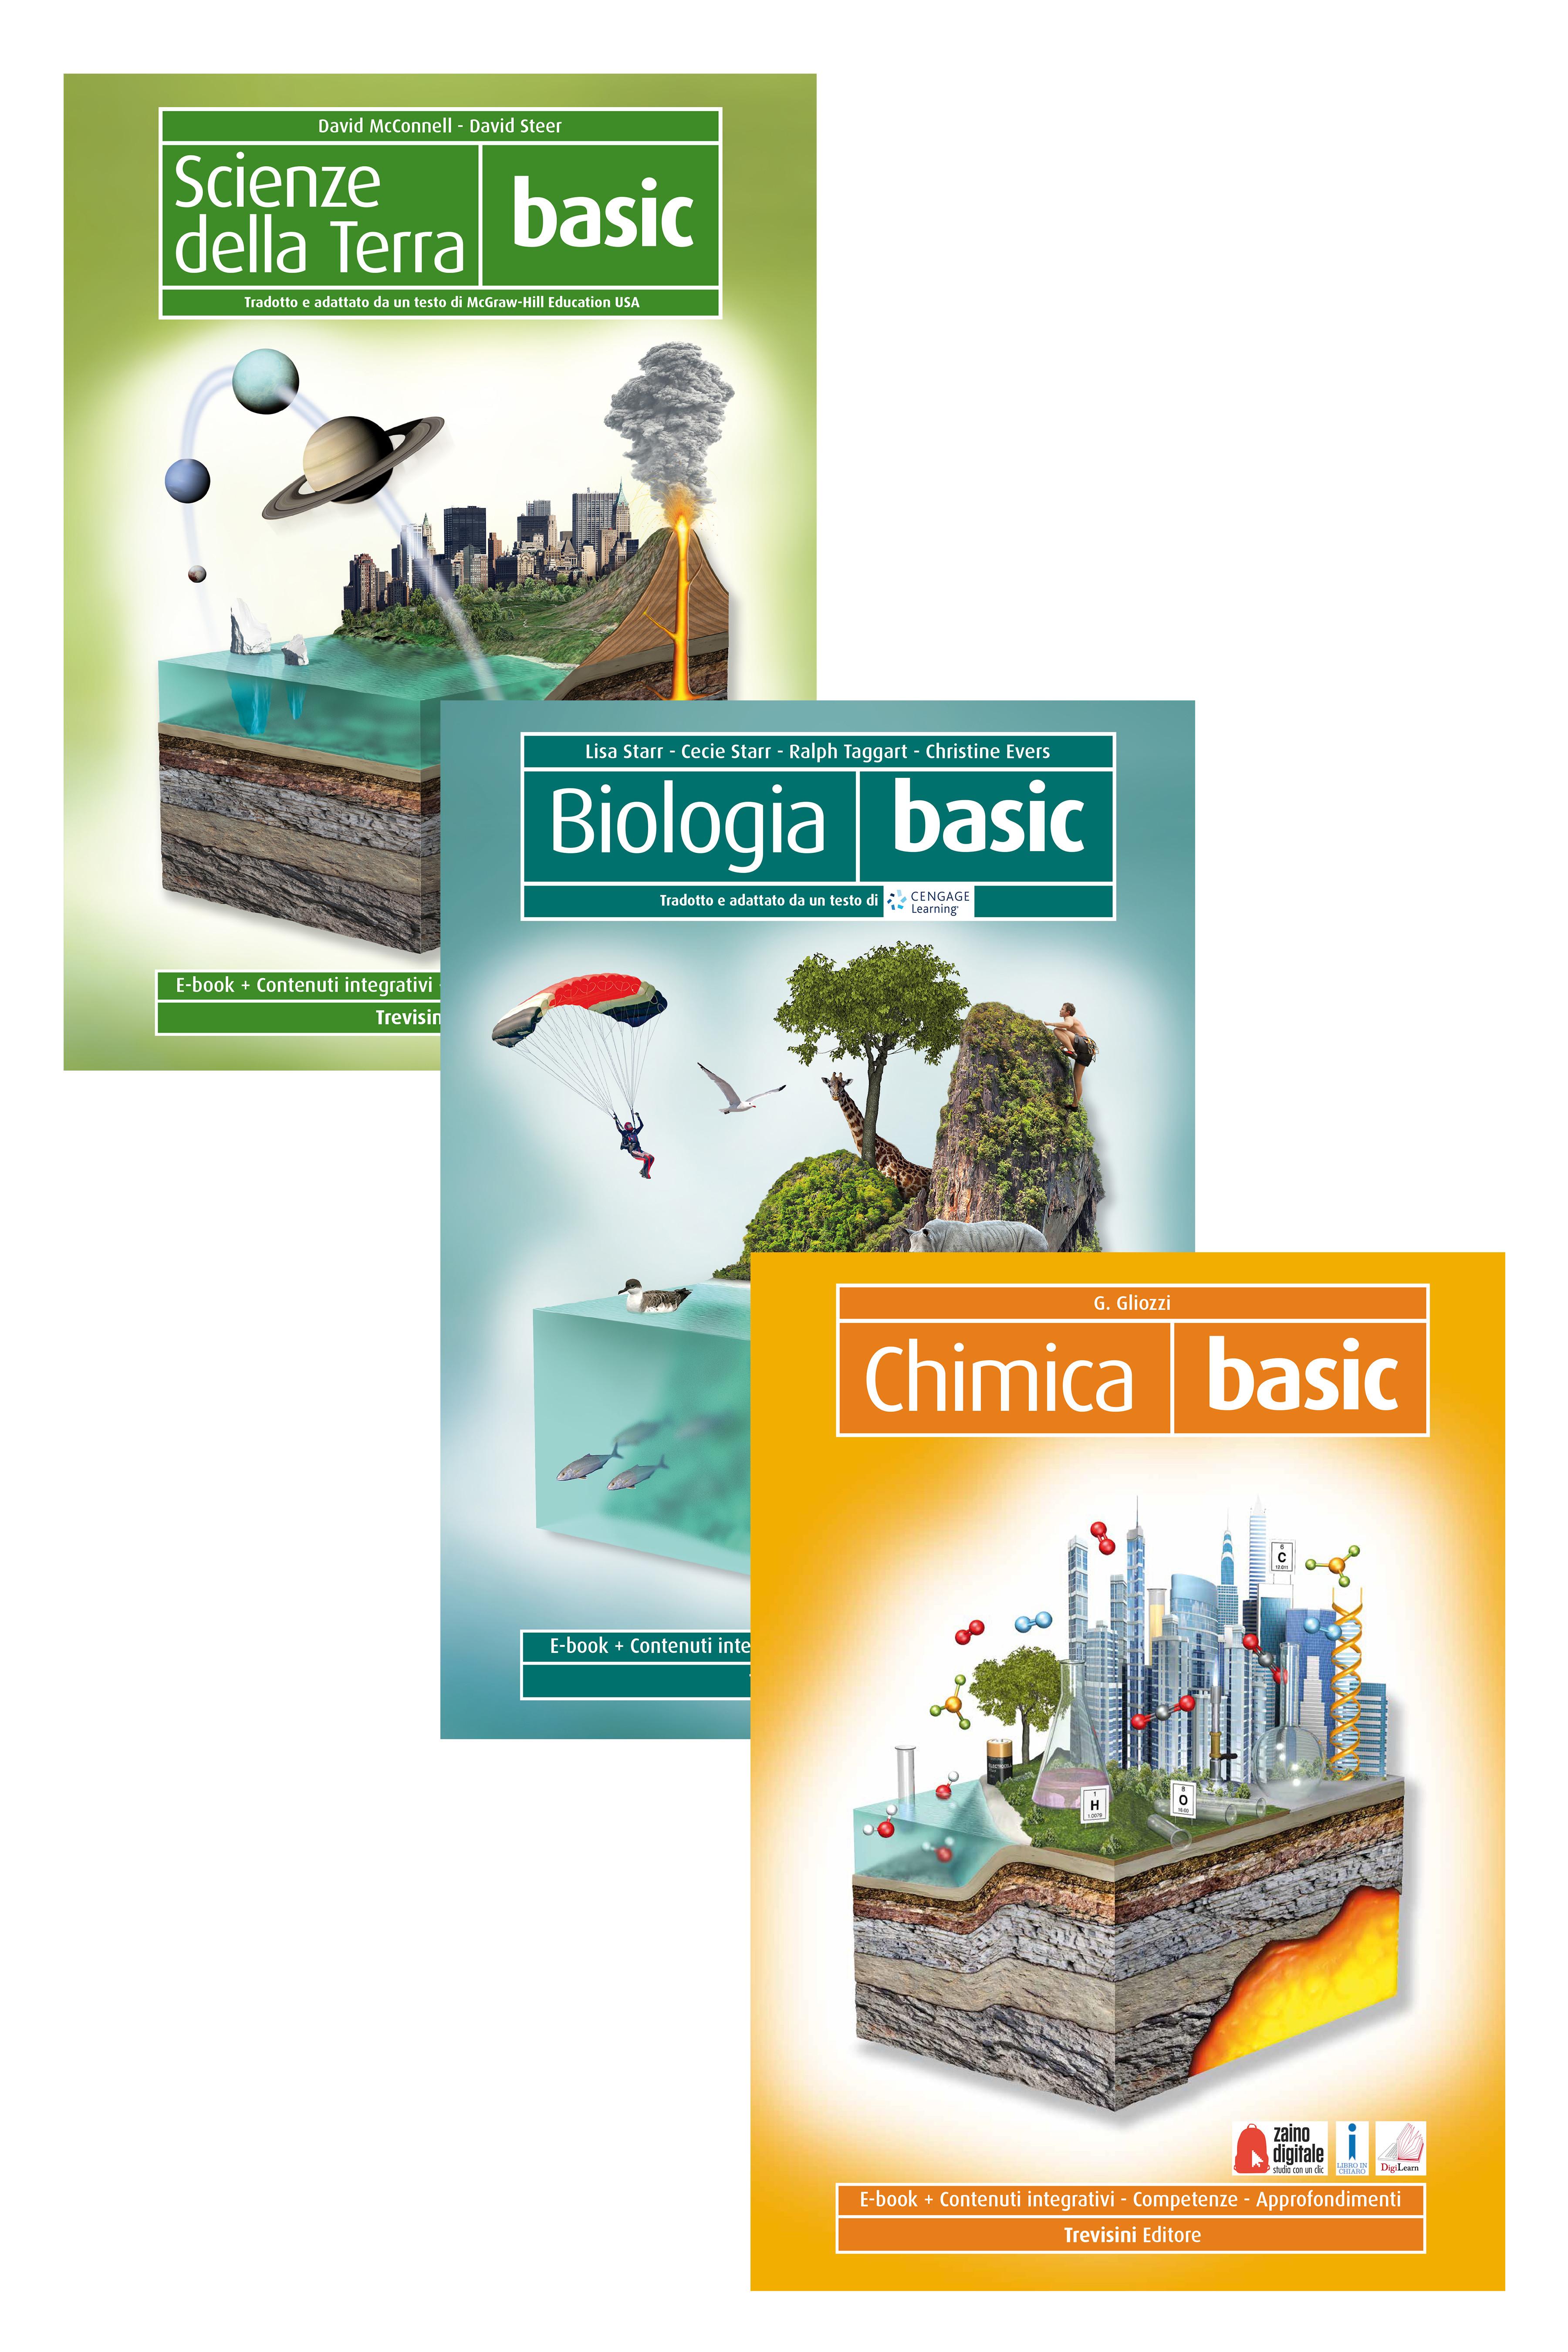 Scienze della terra basic + biologia basic + chimica basic